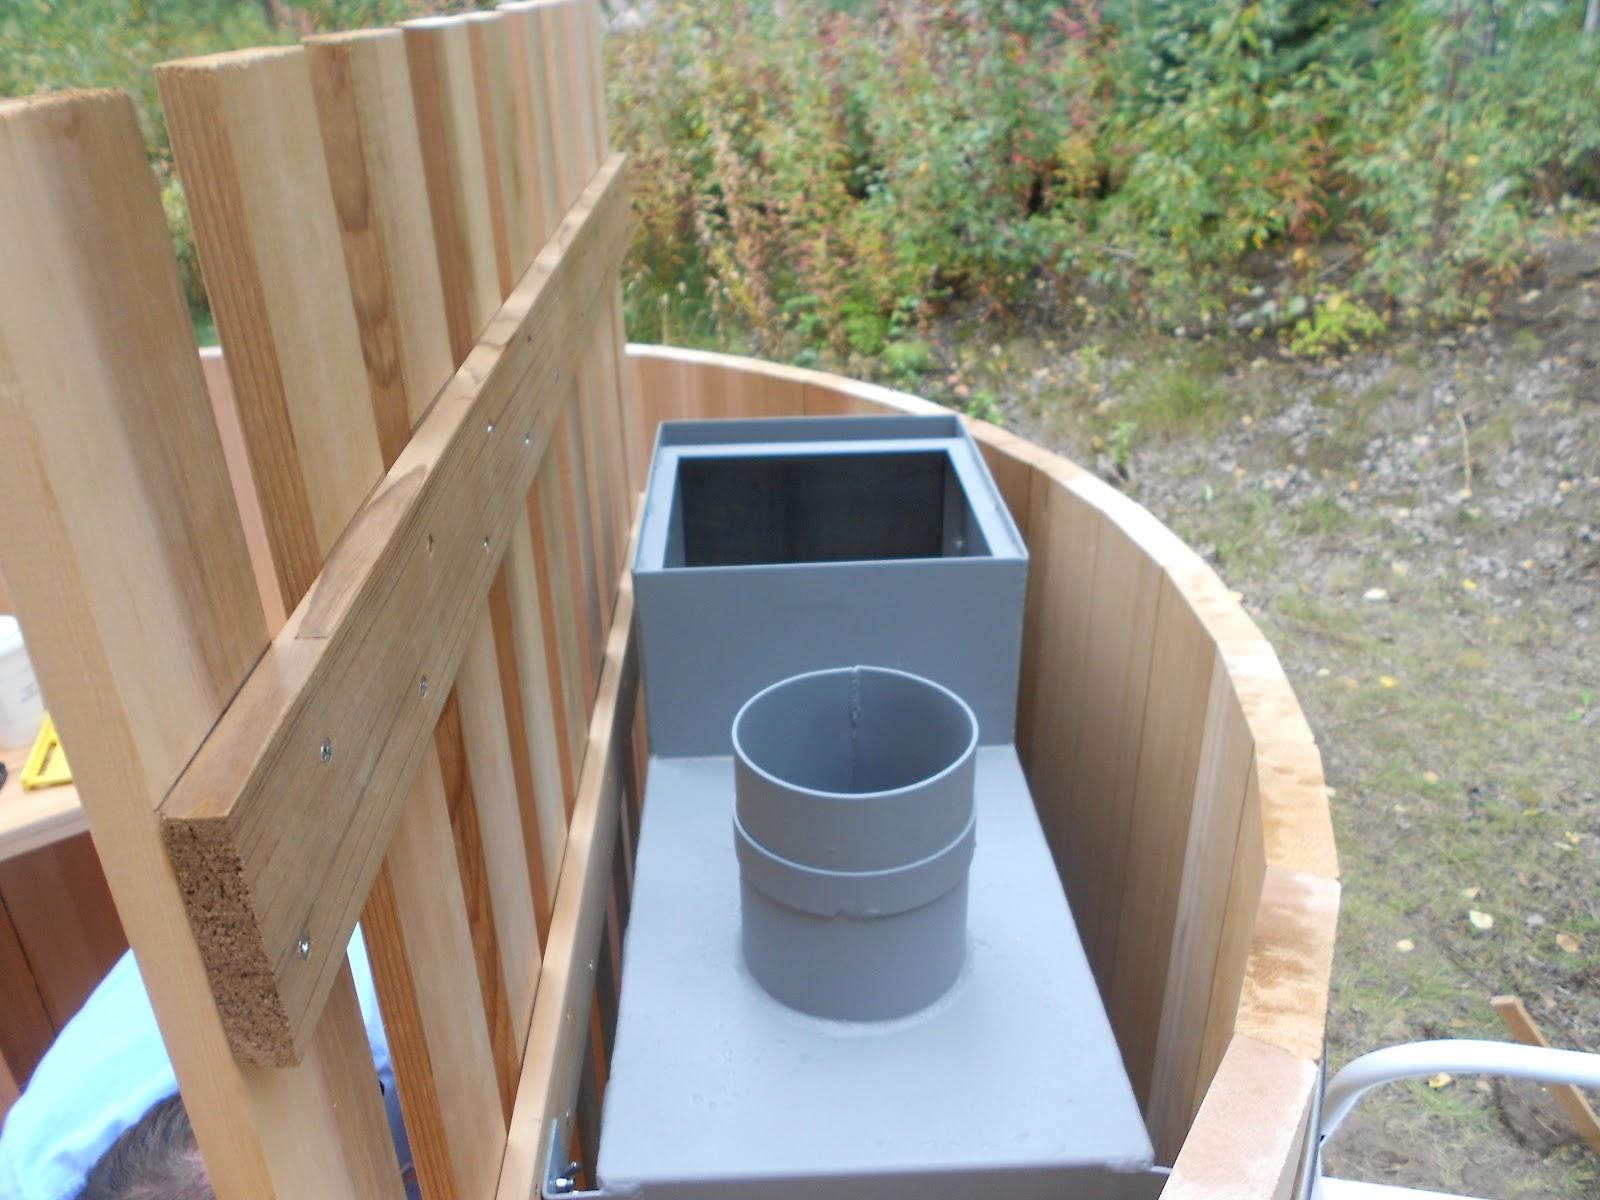 Wood Fired Hot Tub Kit